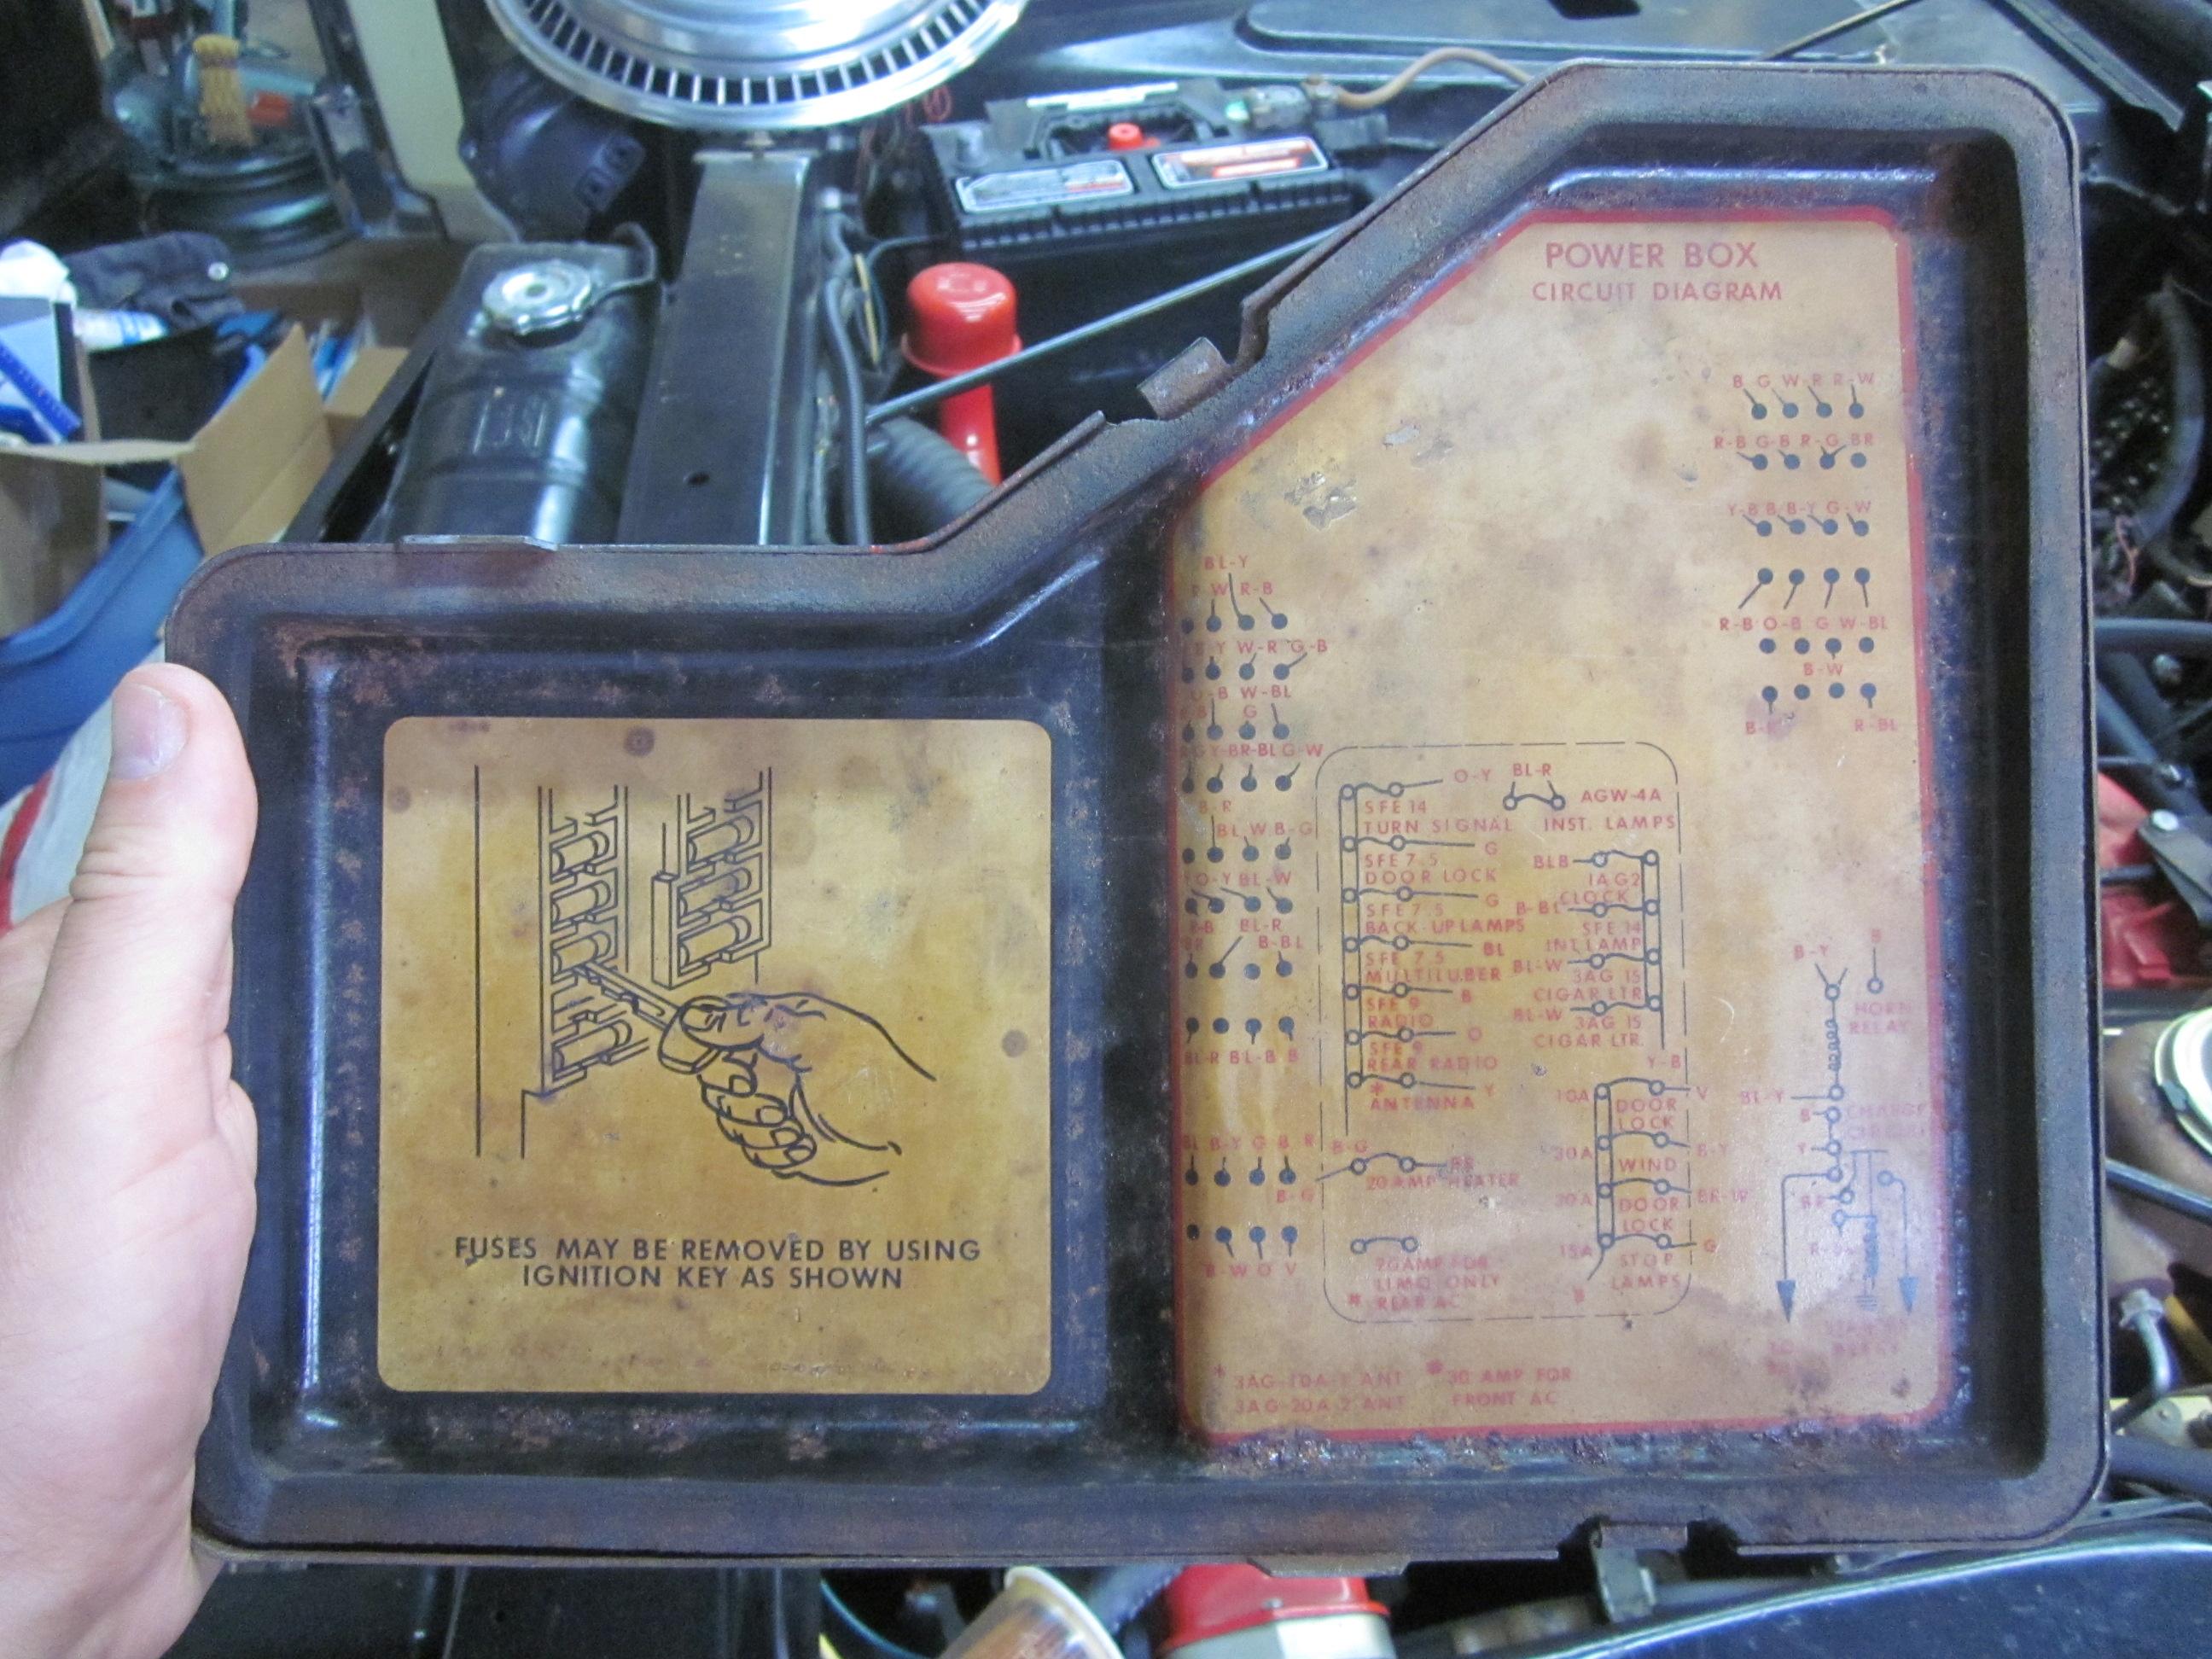 [SCHEMATICS_48IU]  YV_3354] 1967 Ford Ltd Fuse Box Free Diagram | 1966 Ford Thunderbird Fuse Box Location |  | Mous Atota Habi Tobiq Knie Itive Urga Cette Nnigh Timew Inrebe  Mohammedshrine Librar Wiring 101